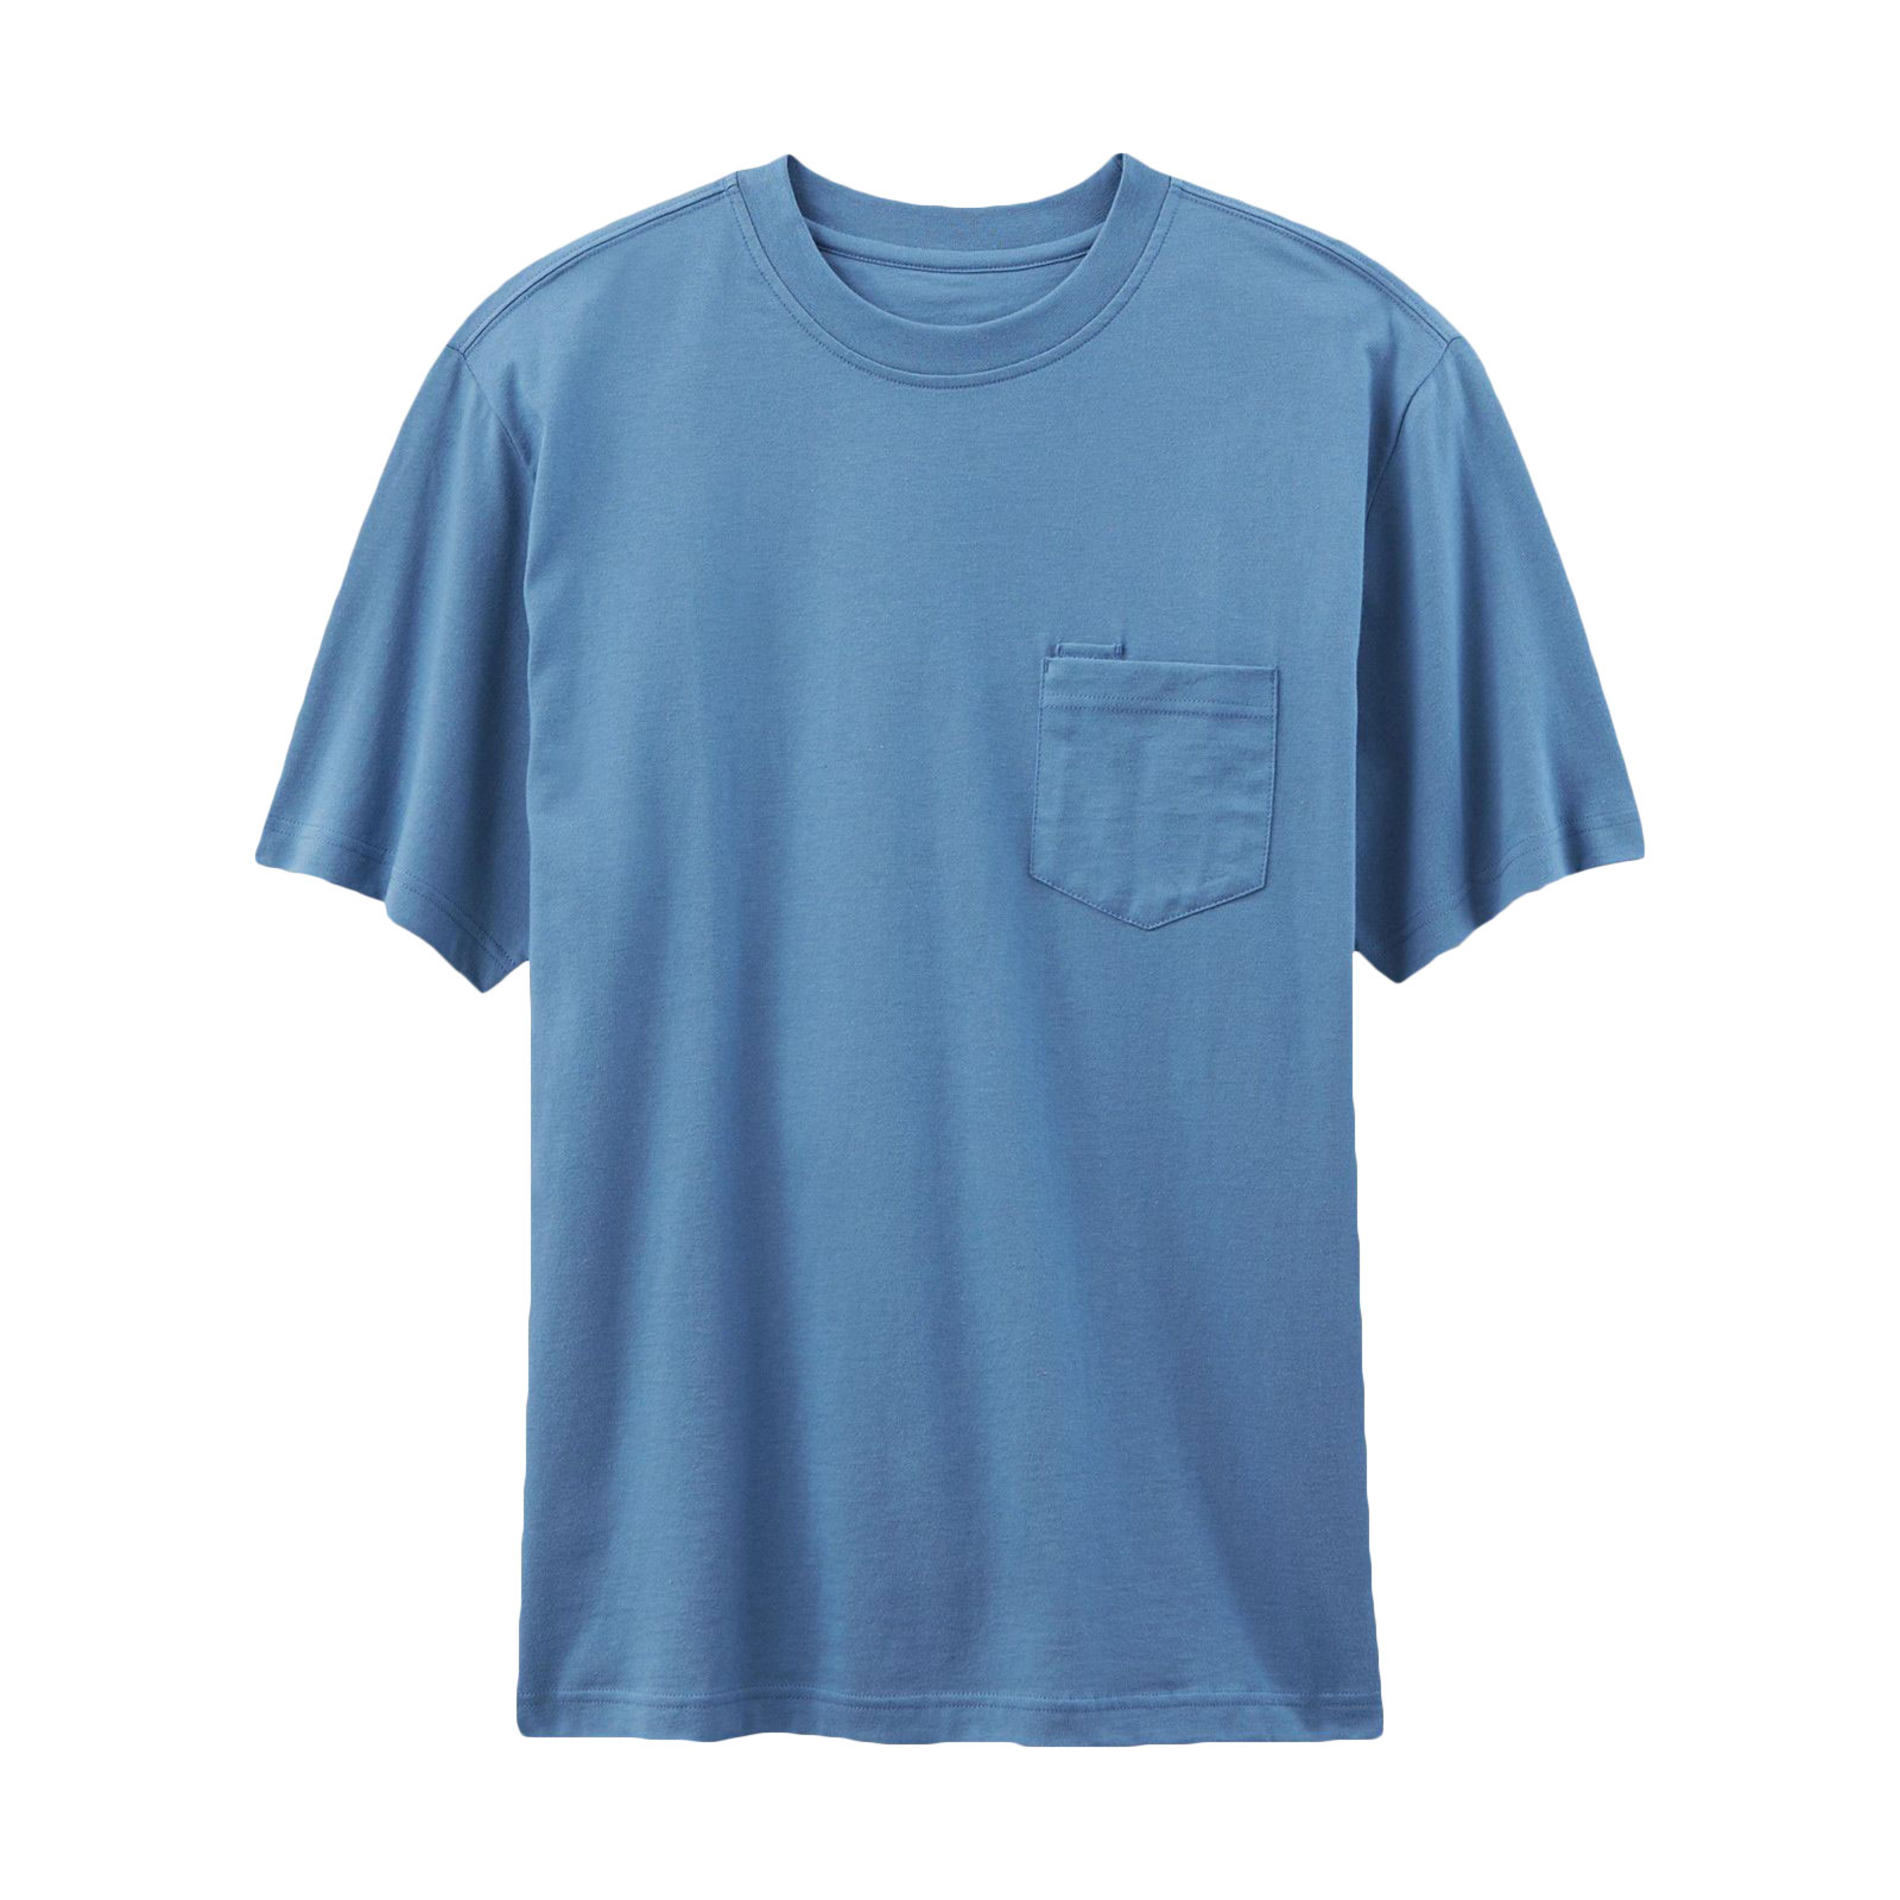 Craftsman Men's Pocket T-Shirt